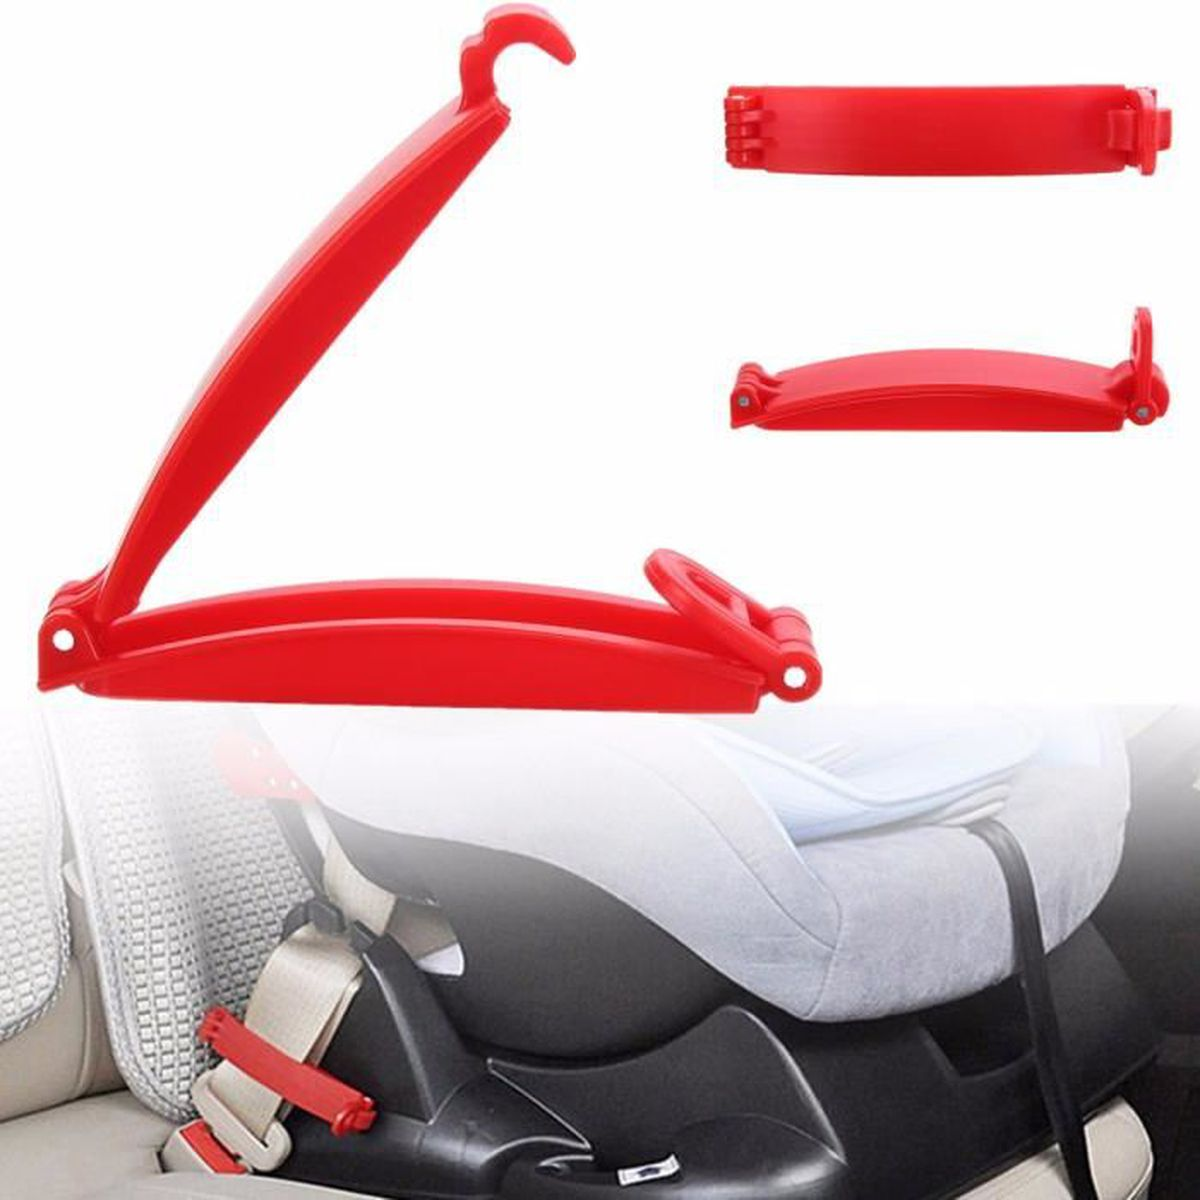 pince ceinture de securite achat vente pince ceinture de securite pas cher les soldes sur. Black Bedroom Furniture Sets. Home Design Ideas